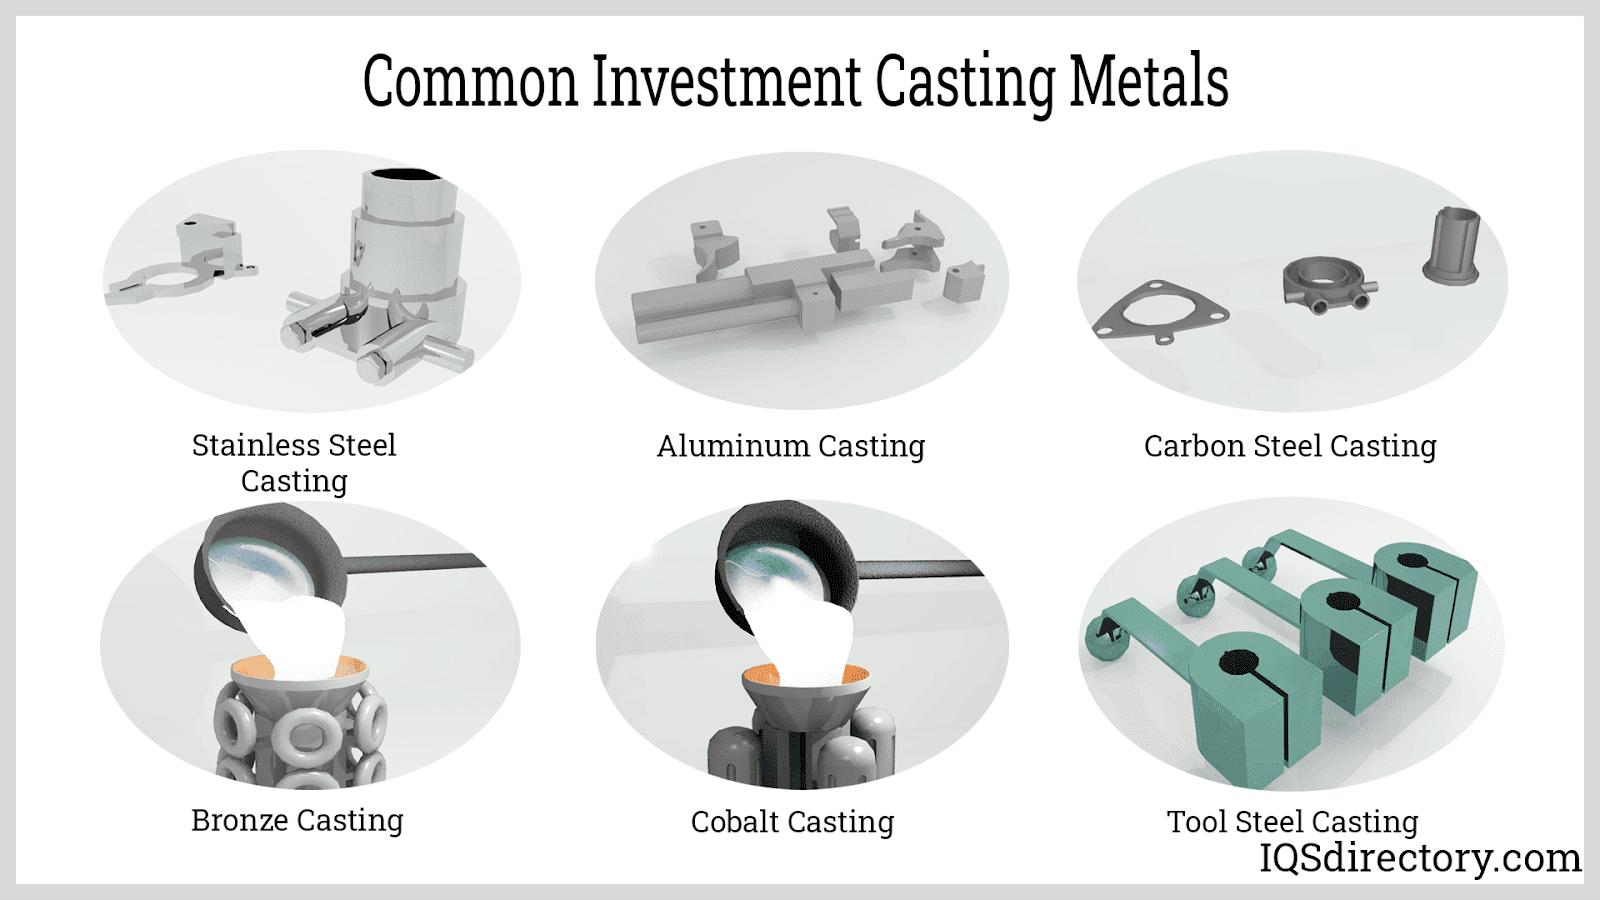 Common Investment Casting Metals